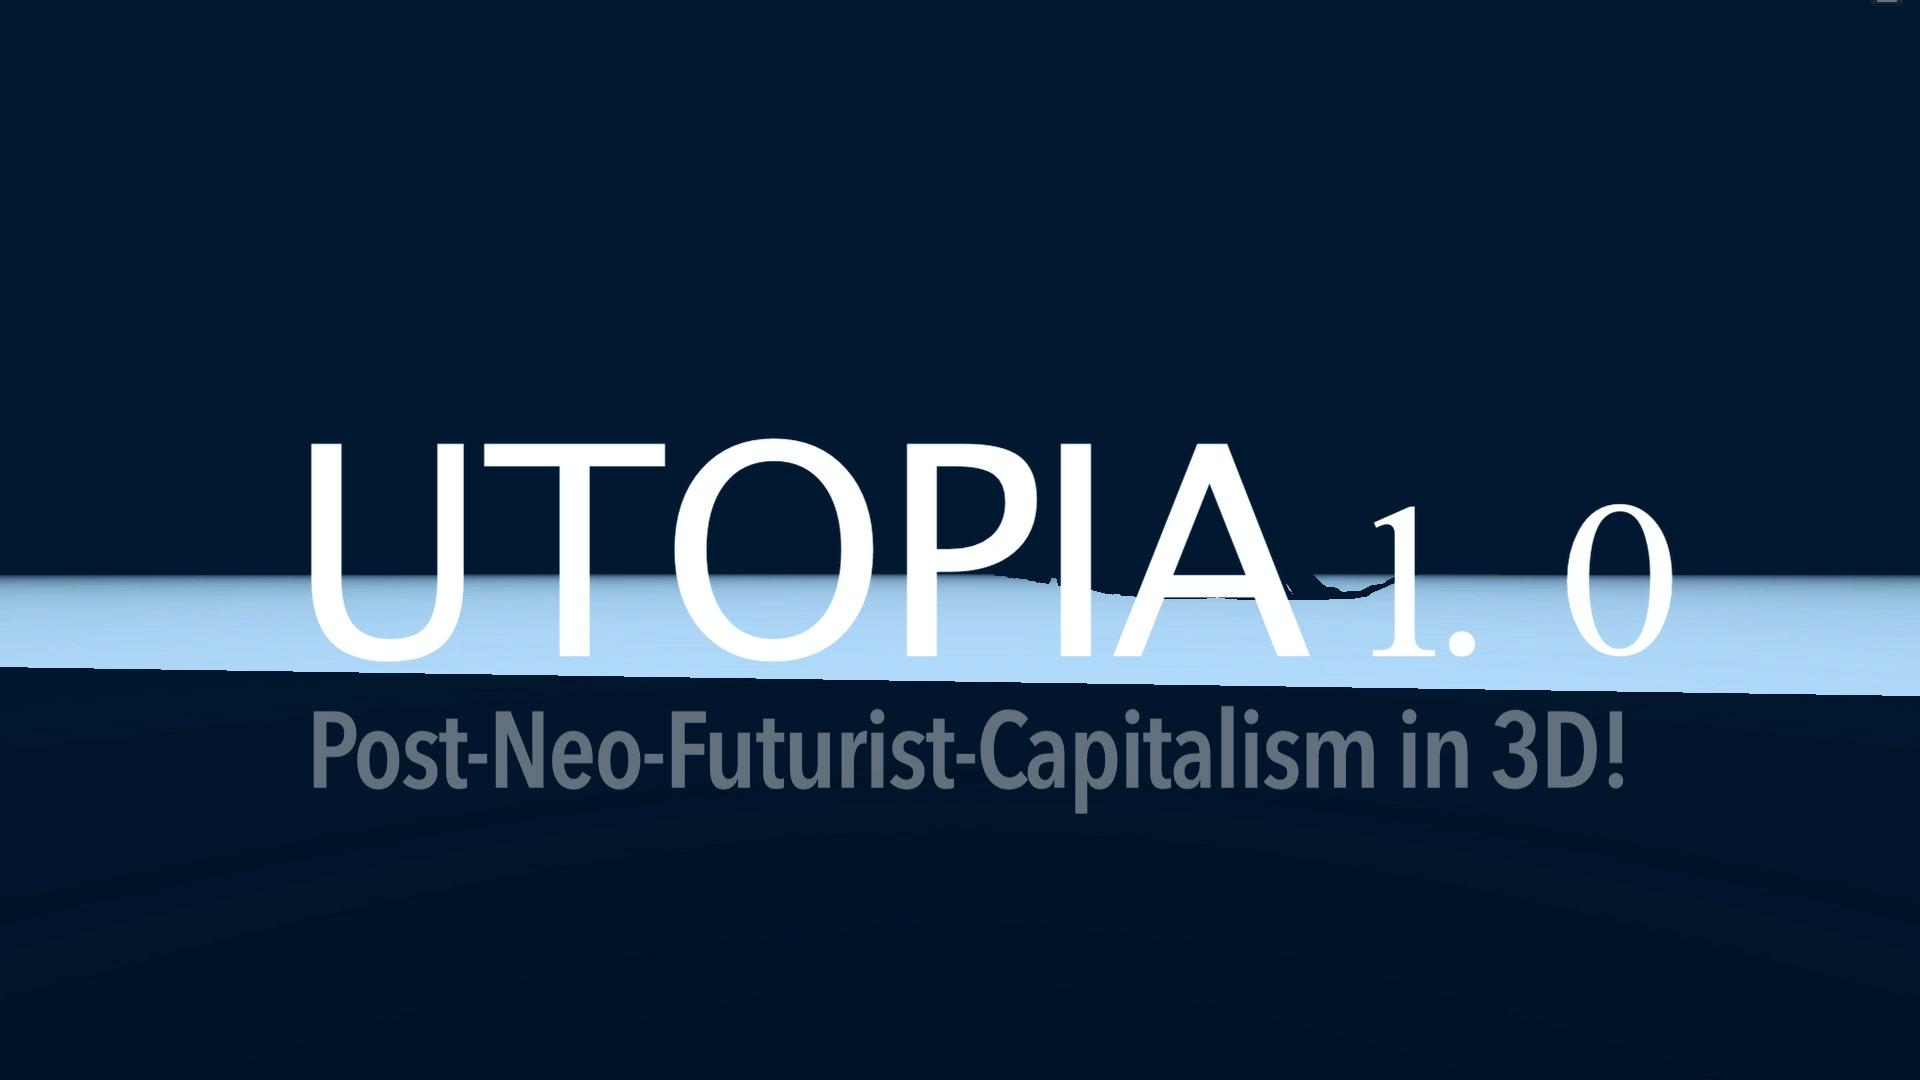 Utopia 1.0: Post-Neo-Futurist-Capitalism in 3D!